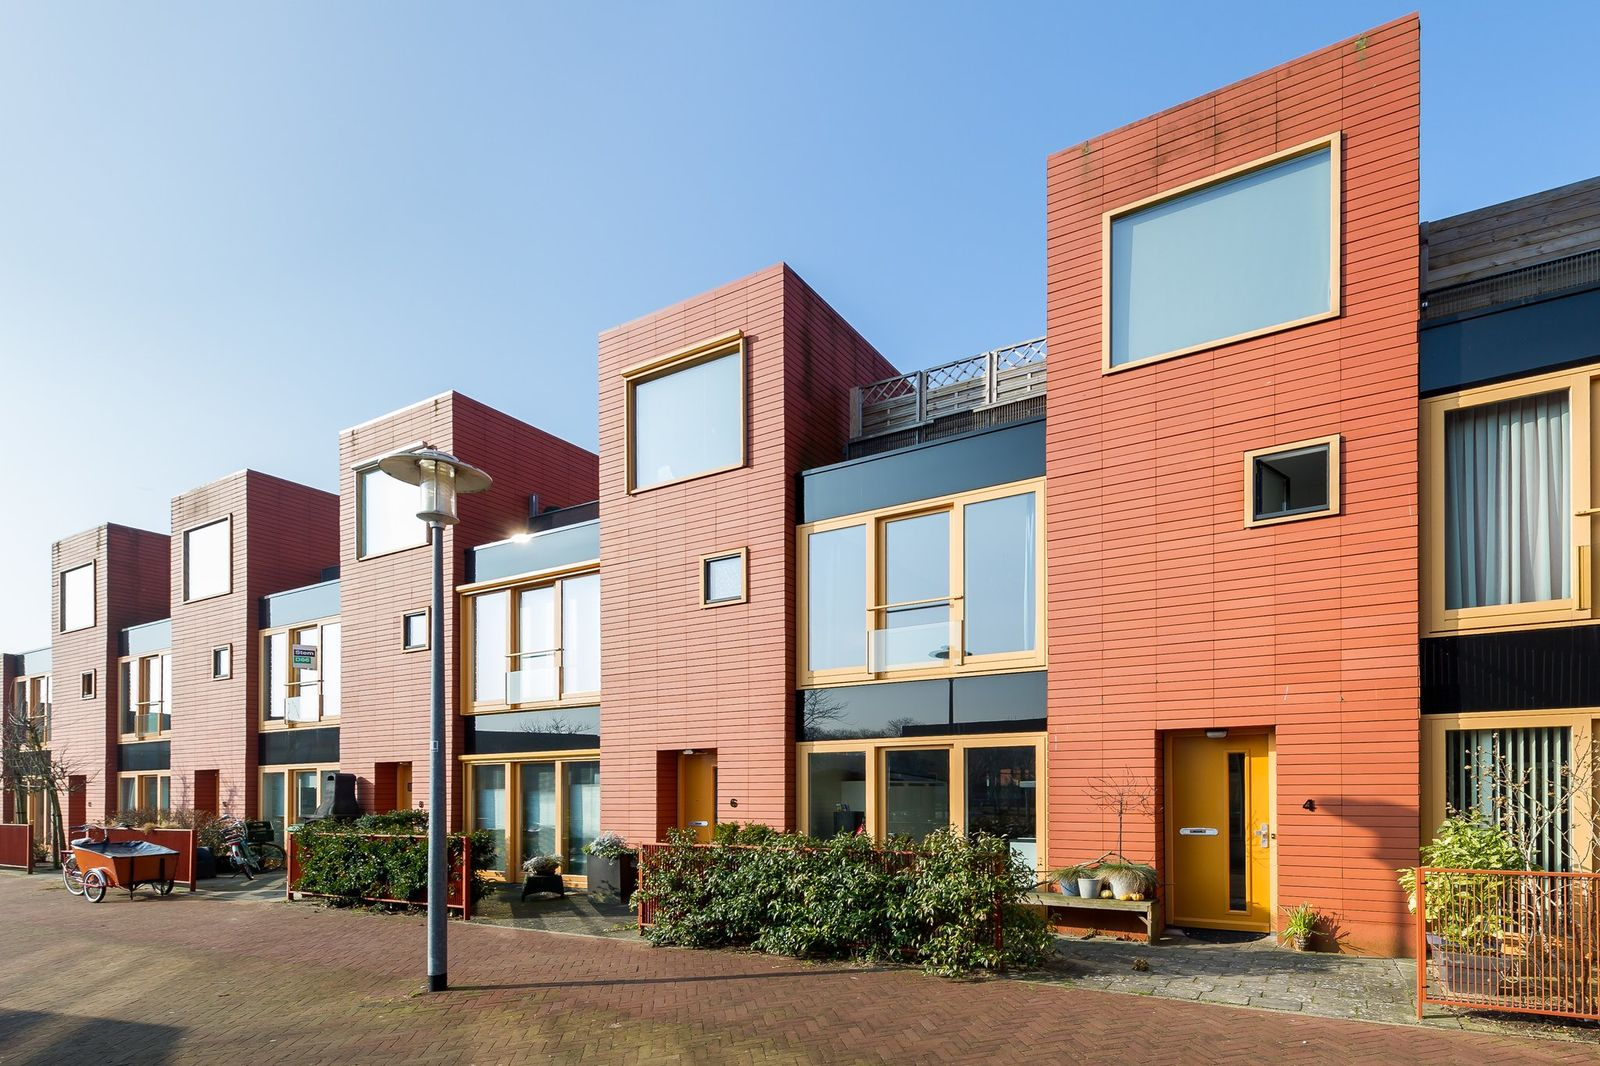 Monacopad 4, Haarlem